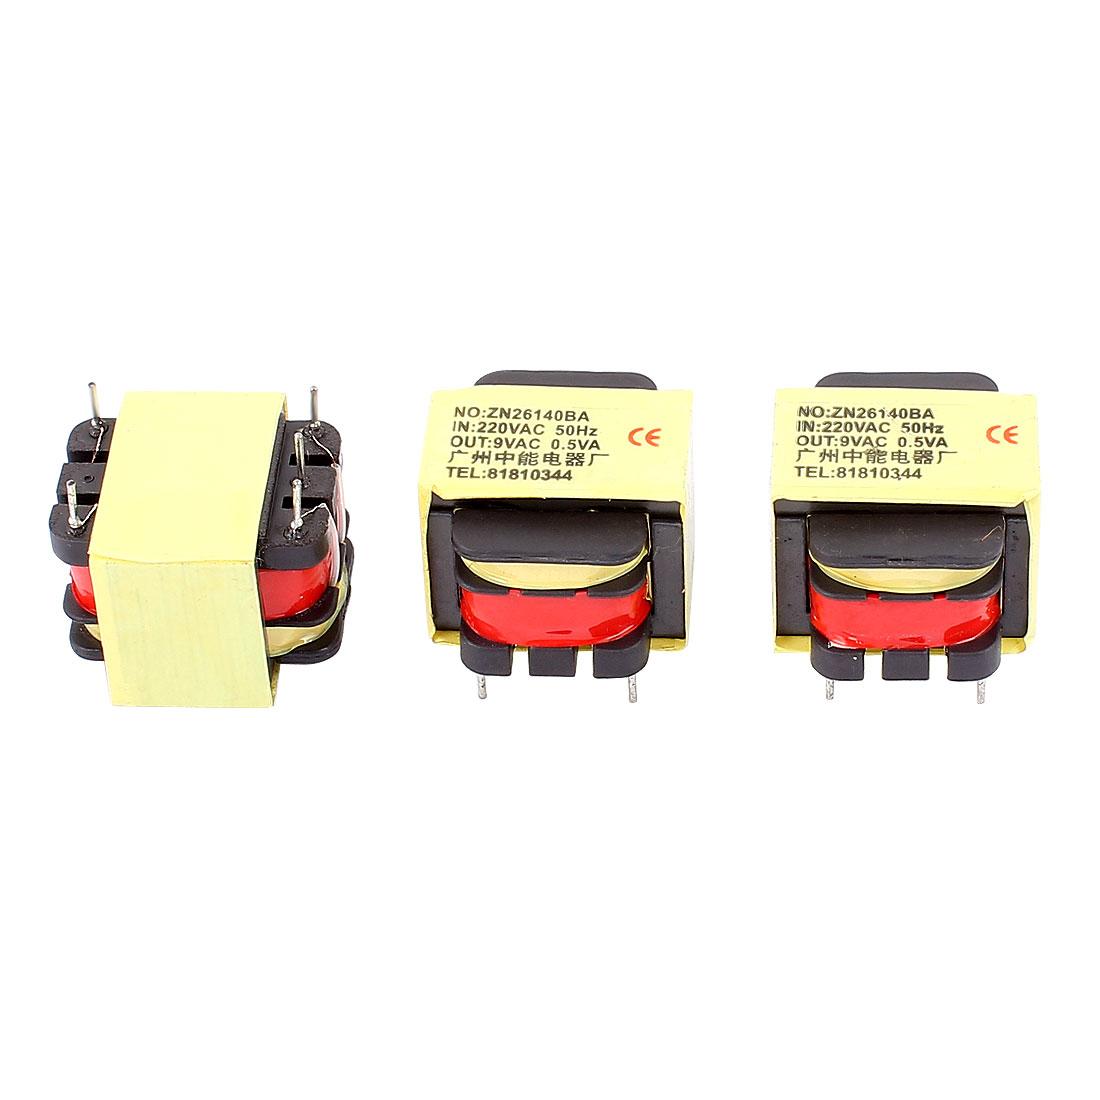 3Pcs 220V Input 9V 0.5VA Output Yellow Red Ferrite Core Power Transformer w 5 Terminals